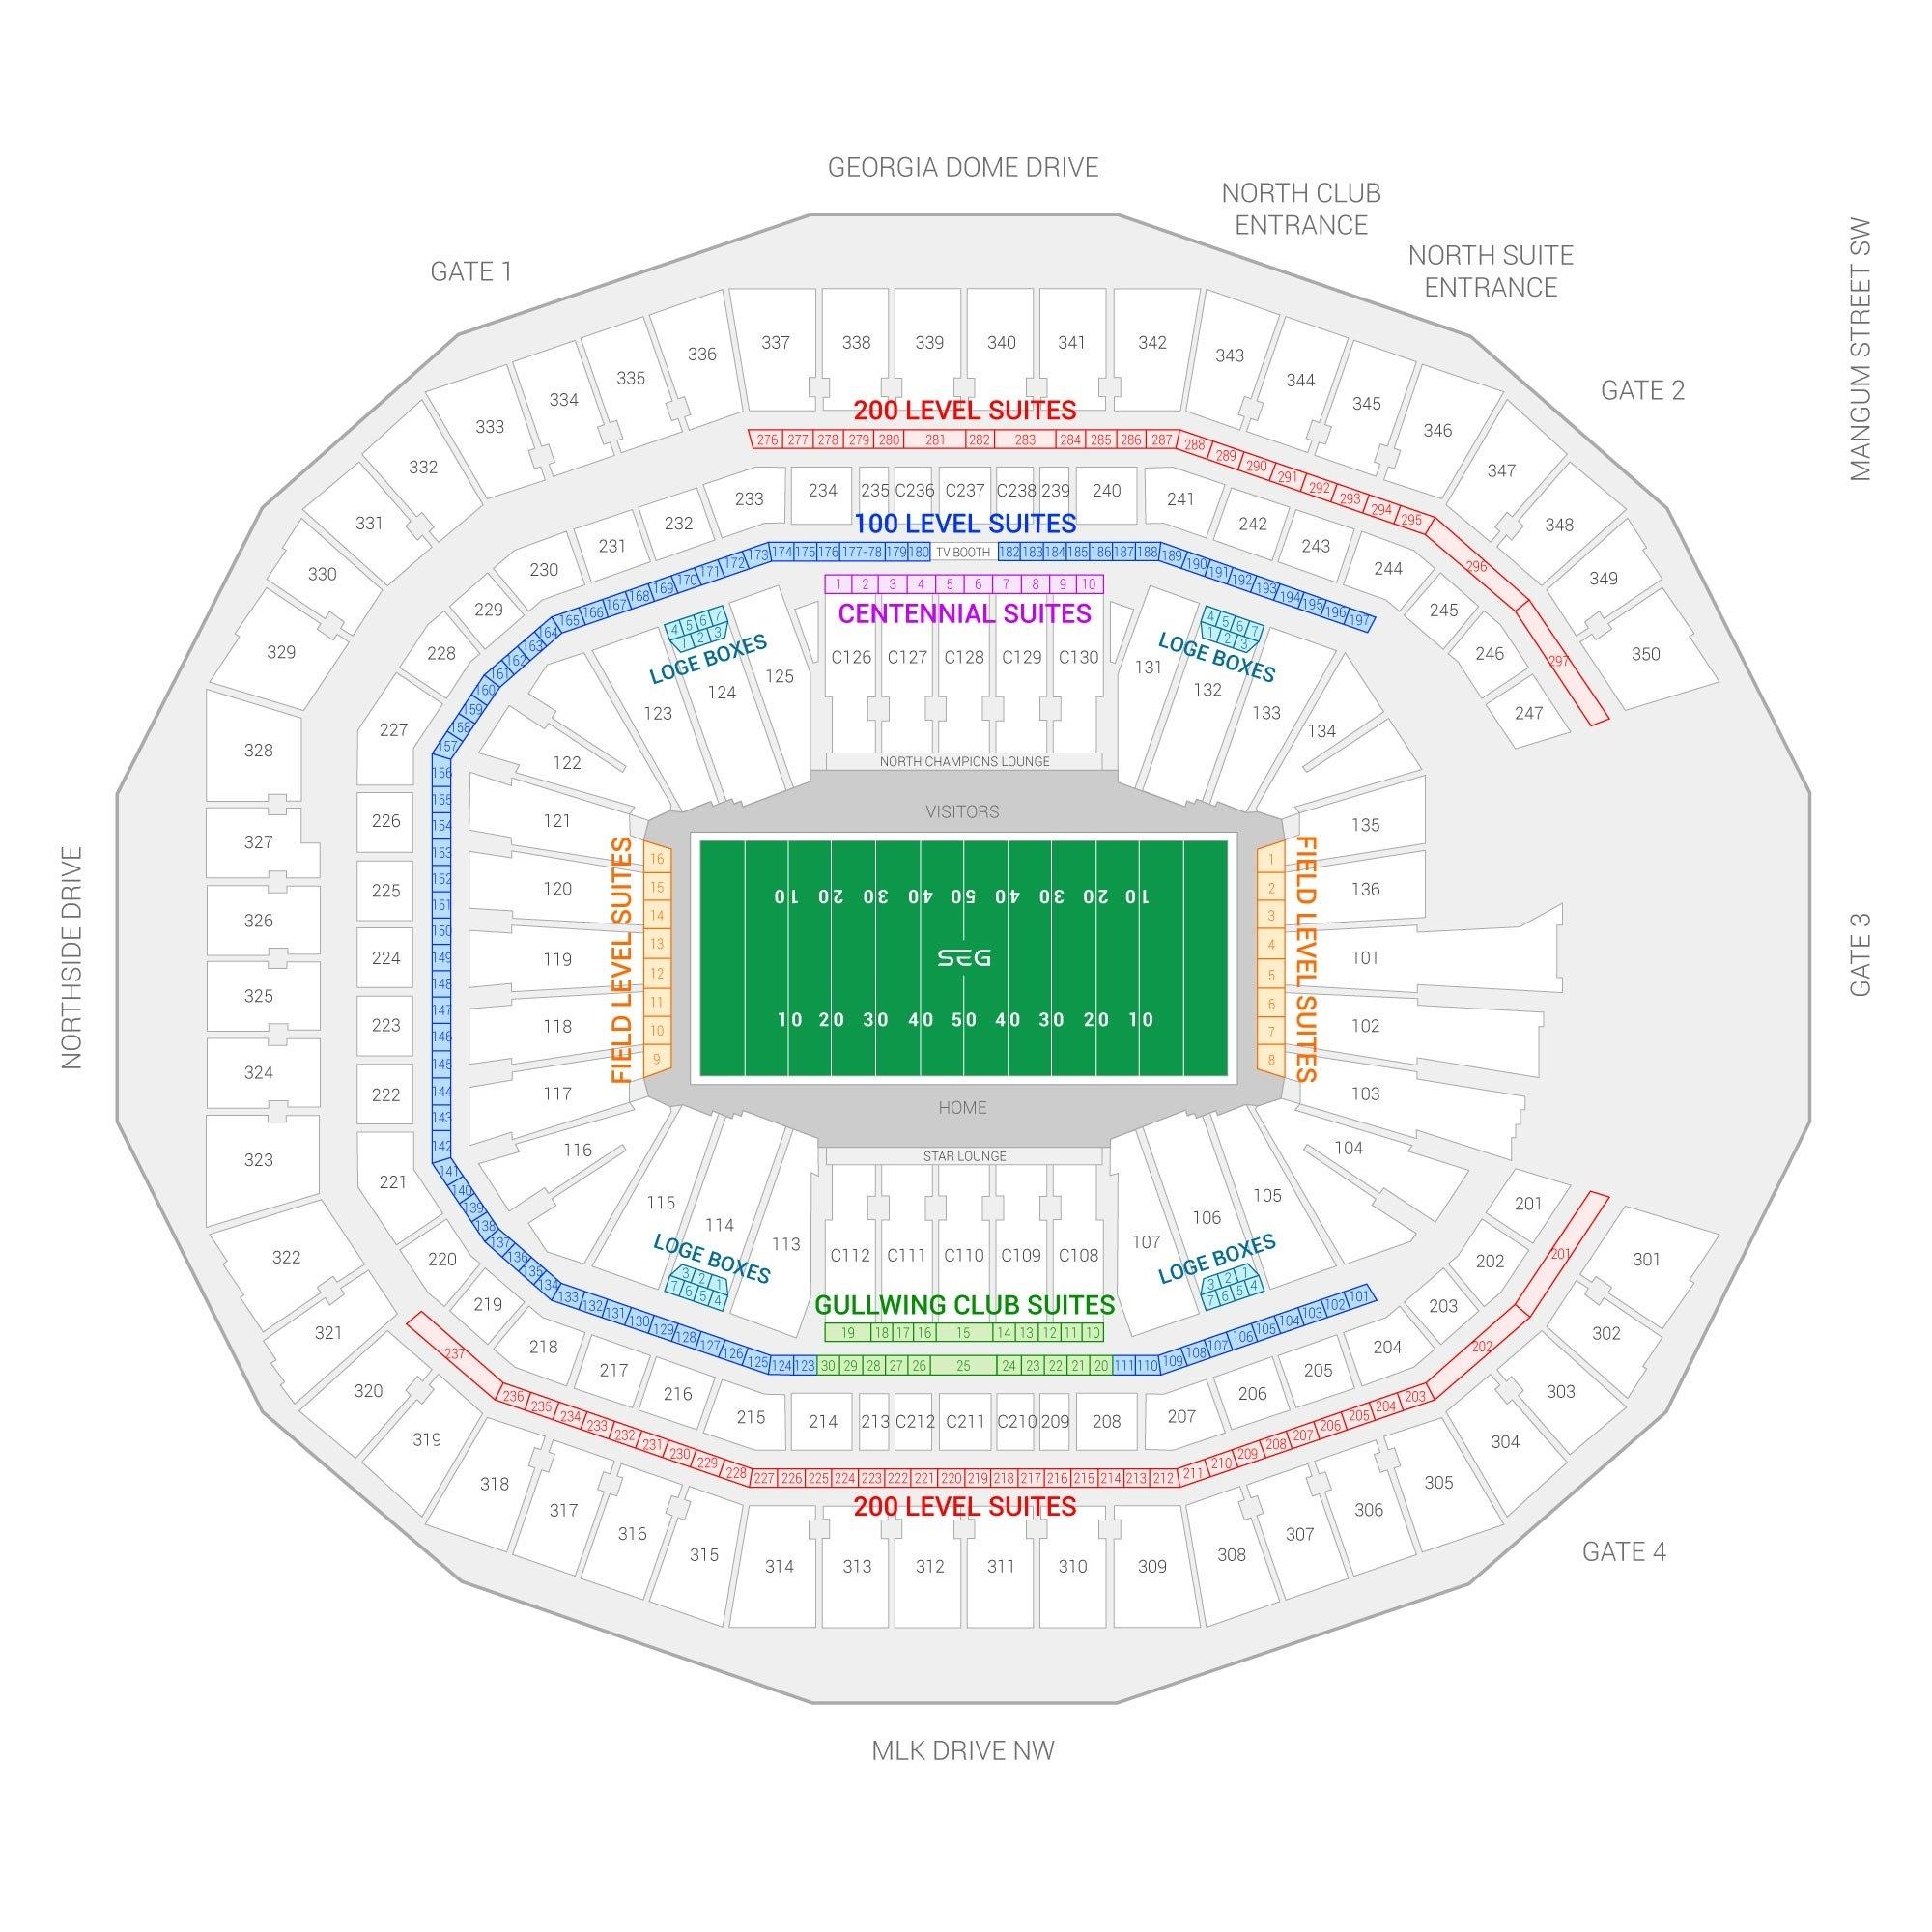 Super Bowl Liii Suite Rentals | Mercedes-Benz Stadium for Super Bowl Atlanta Seating